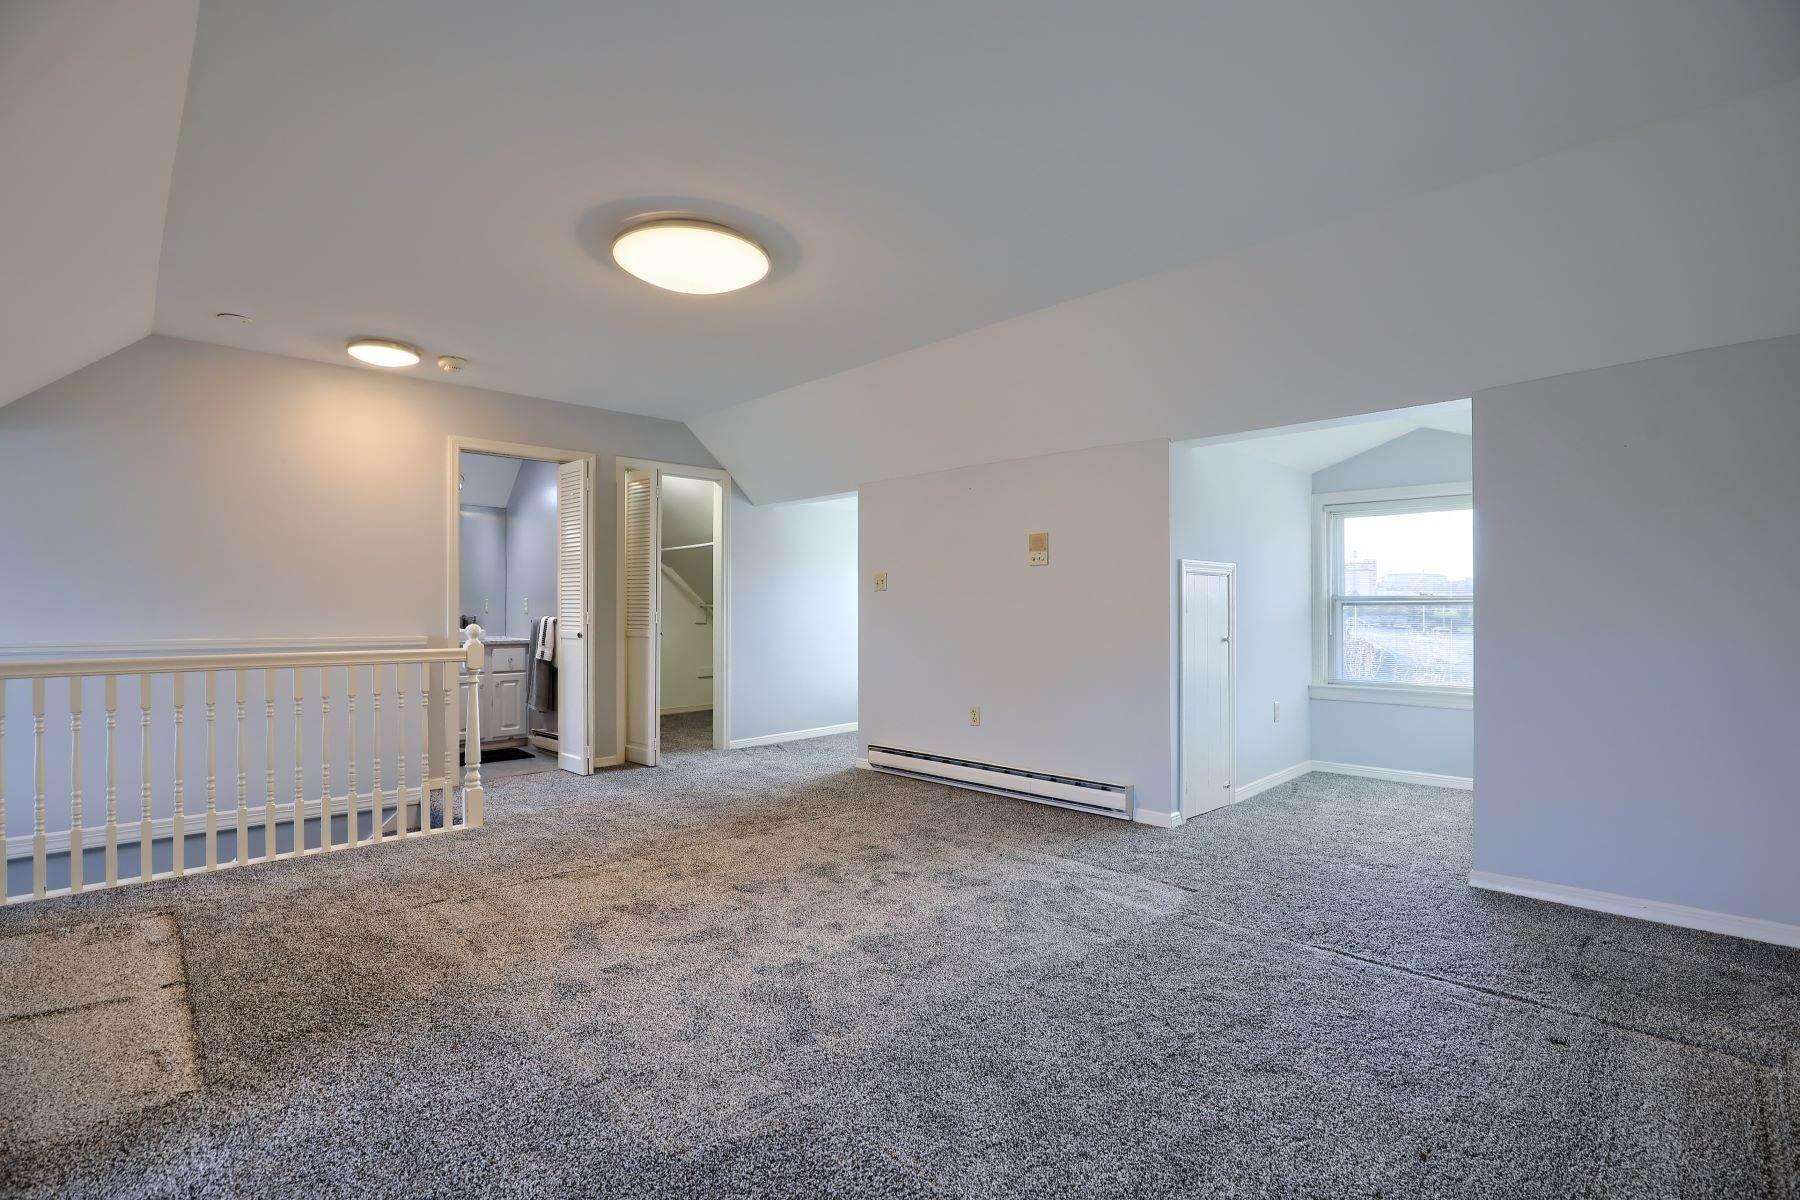 33. Single Family Homes for Sale at 206 E Granada Ave Hershey, Pennsylvania 17033 United States